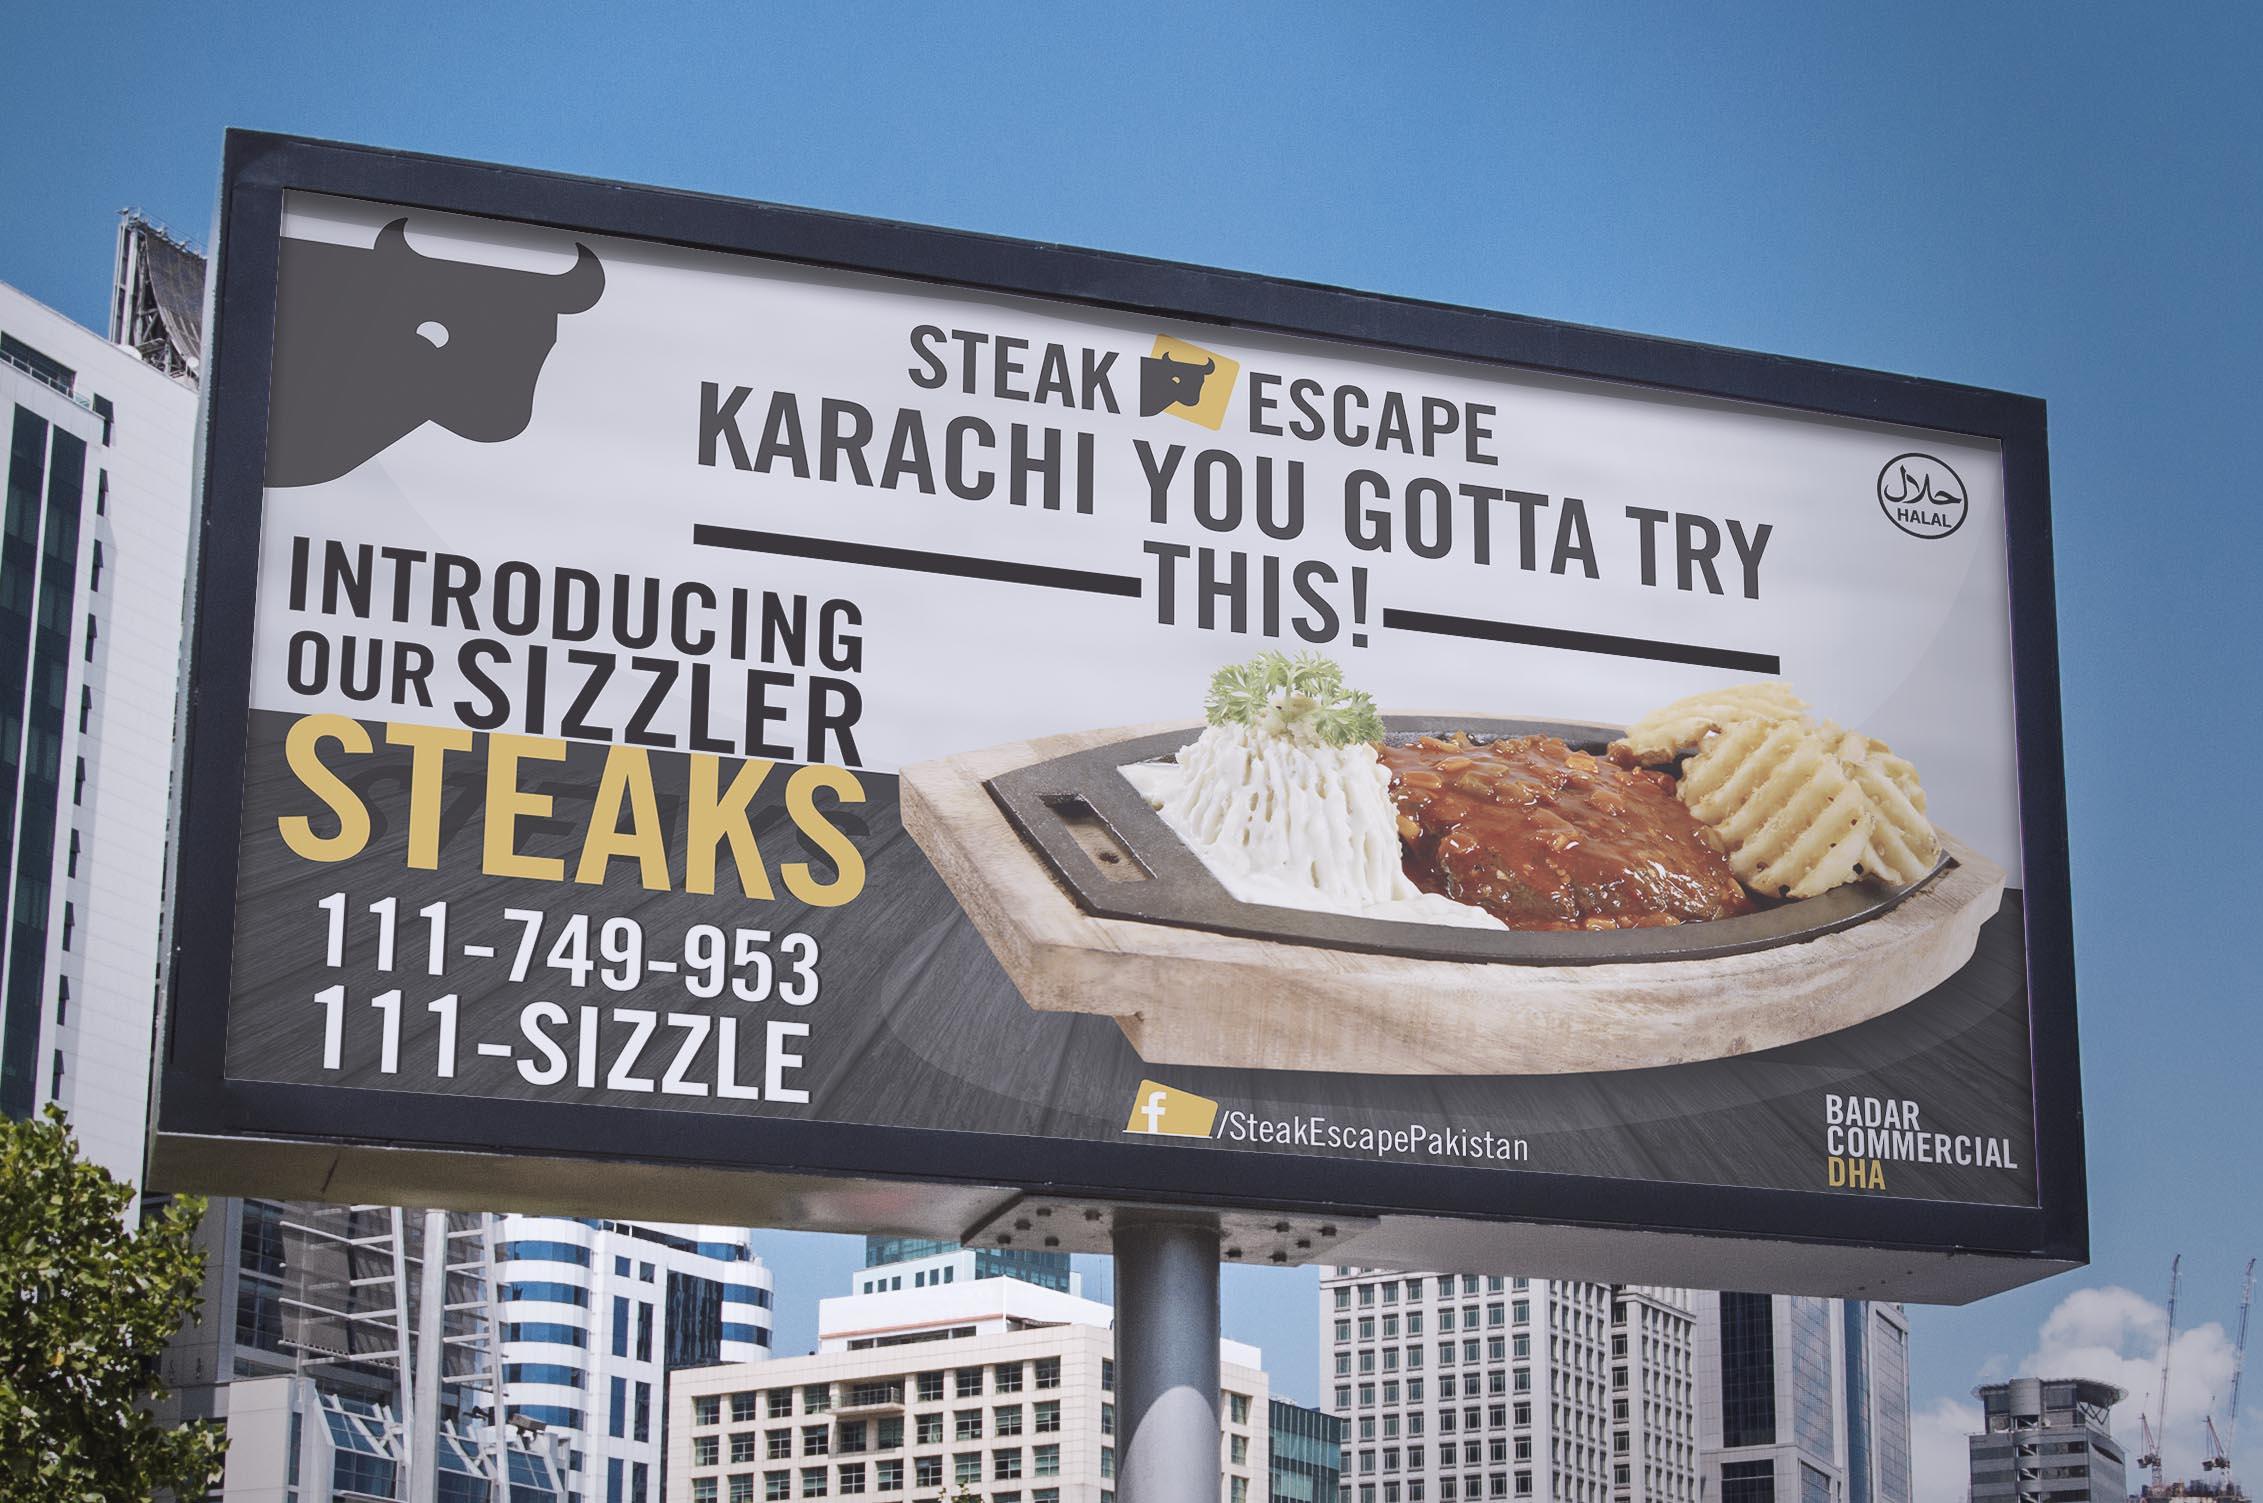 Steak Escape Billboard